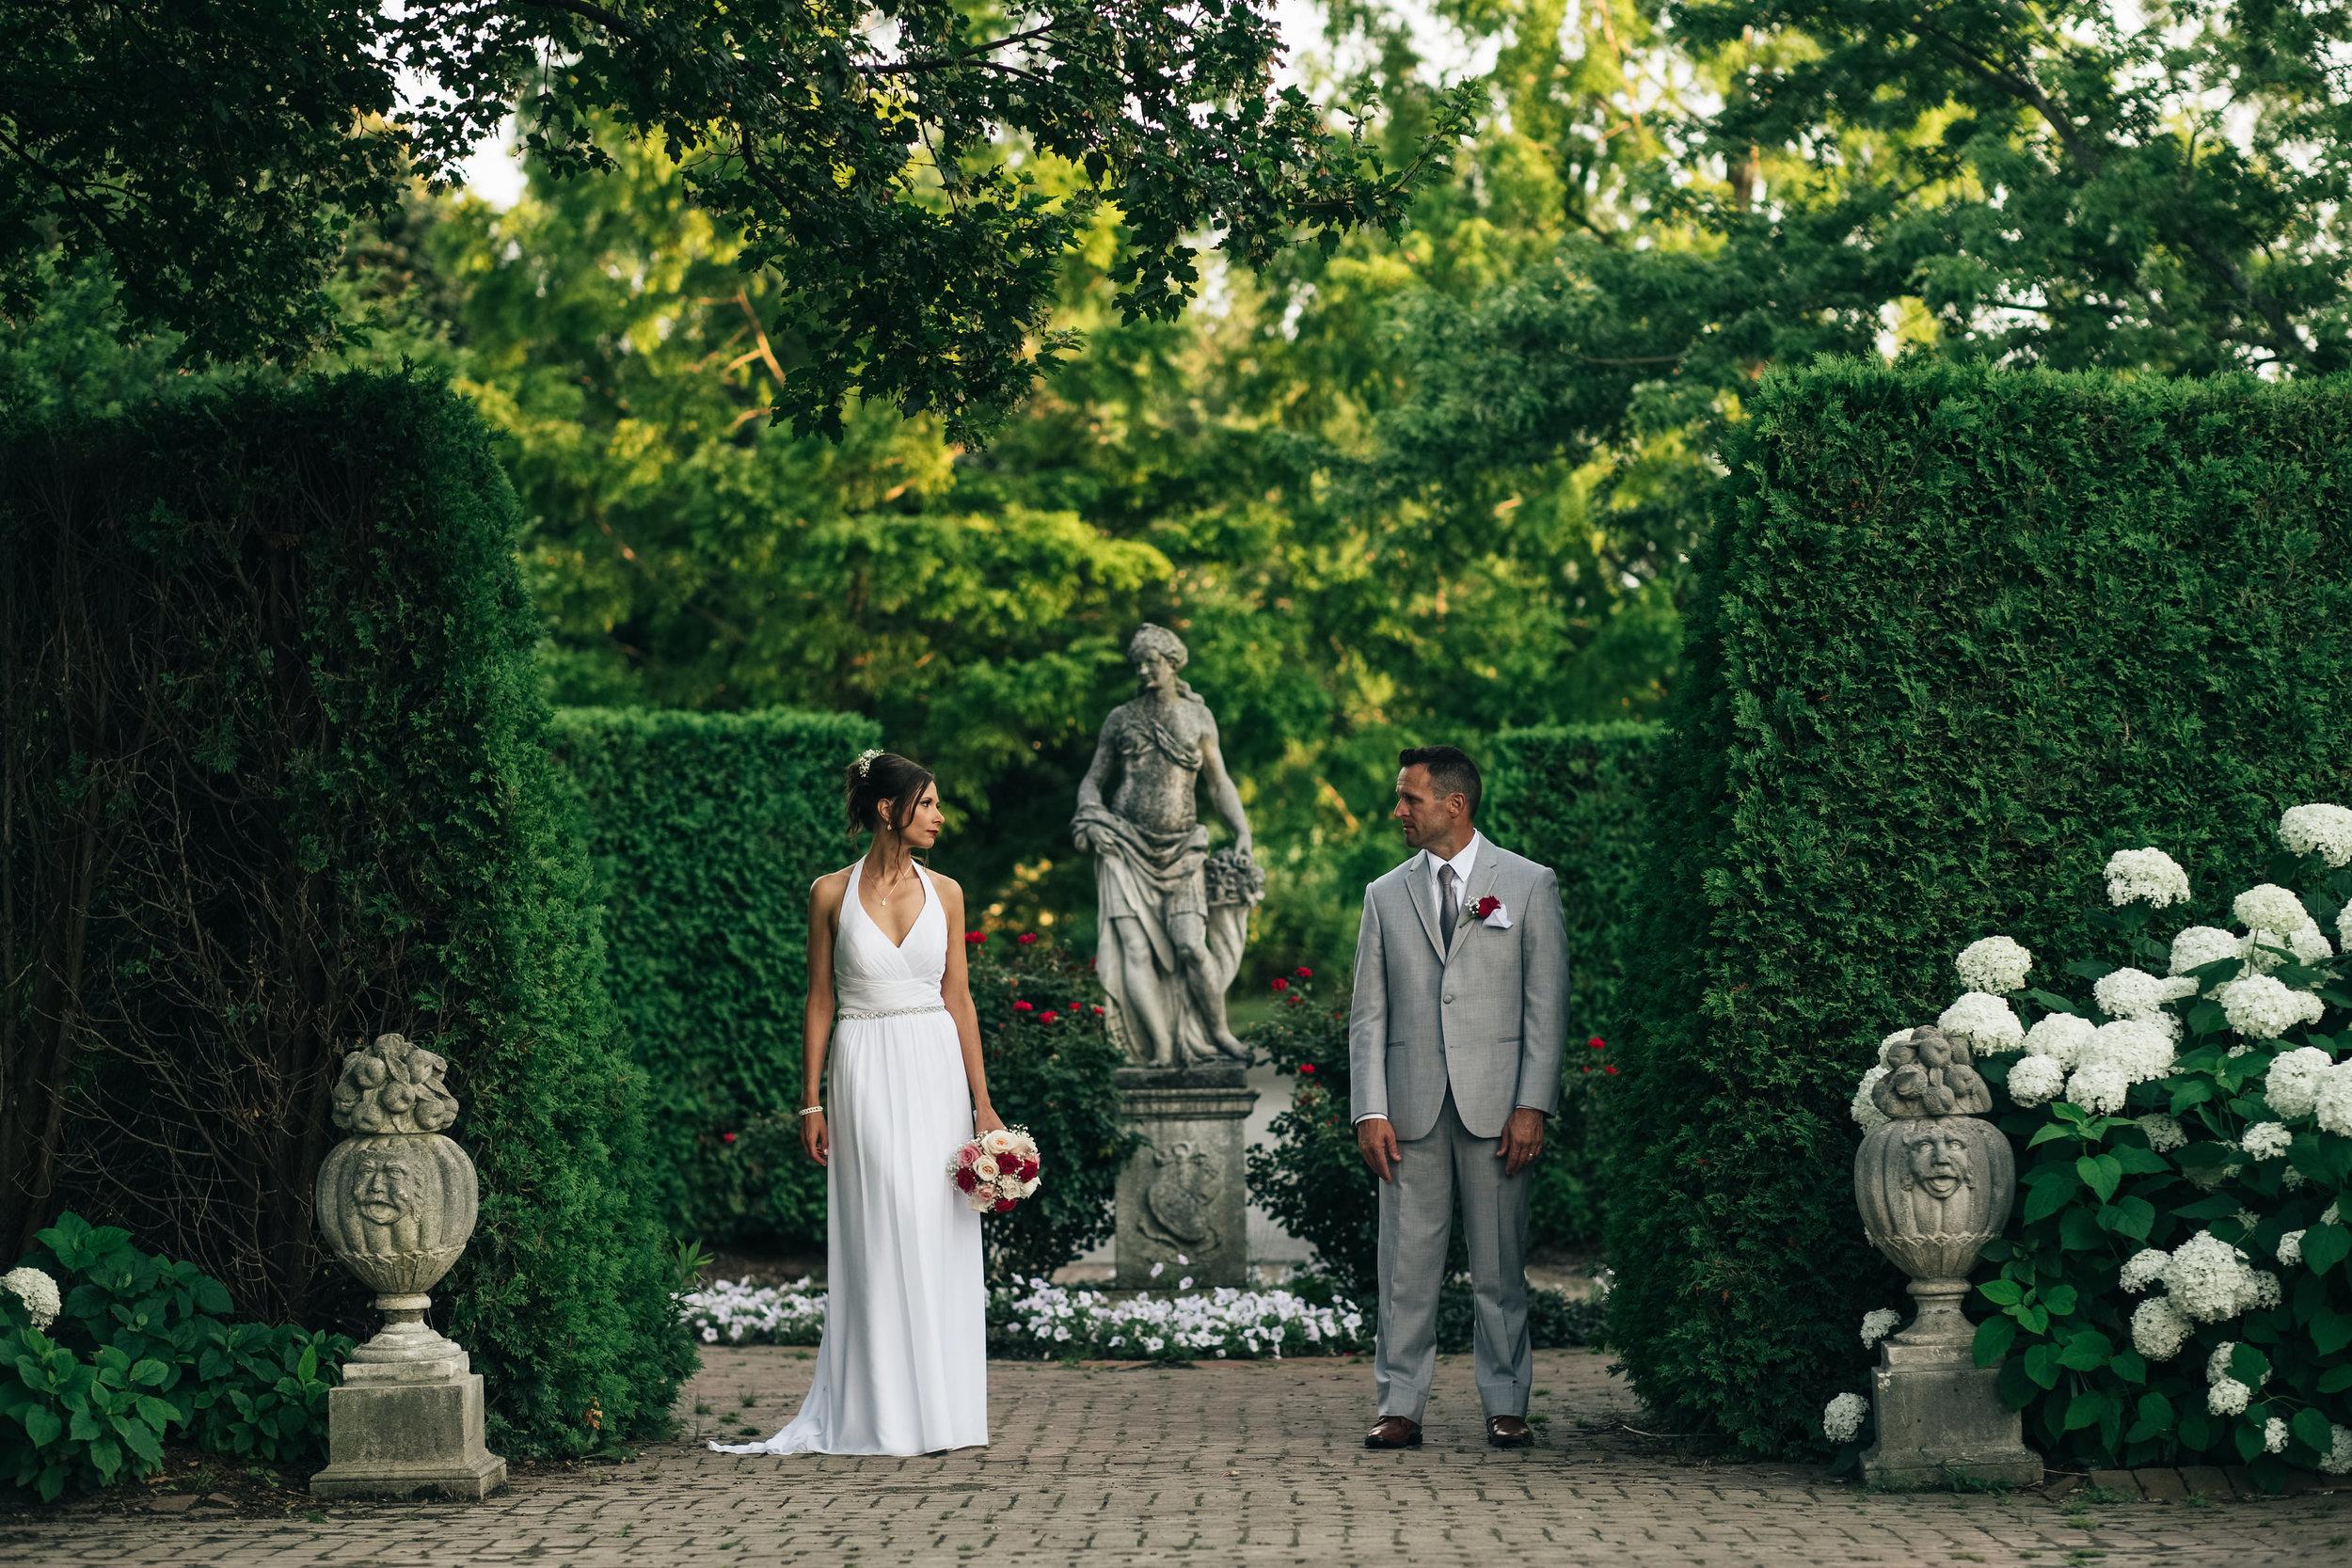 Elopement_Photograpy_at_Toledo_Botanical_Gardens.jpg